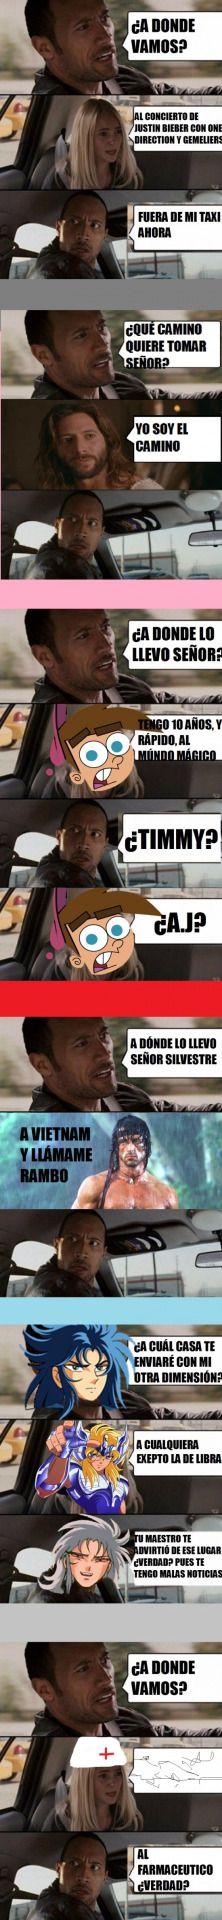 videoswatsapp.com videos graciosos memes risas gifs graciosos chistes divertidas humor http://ift.tt/2l9avV3